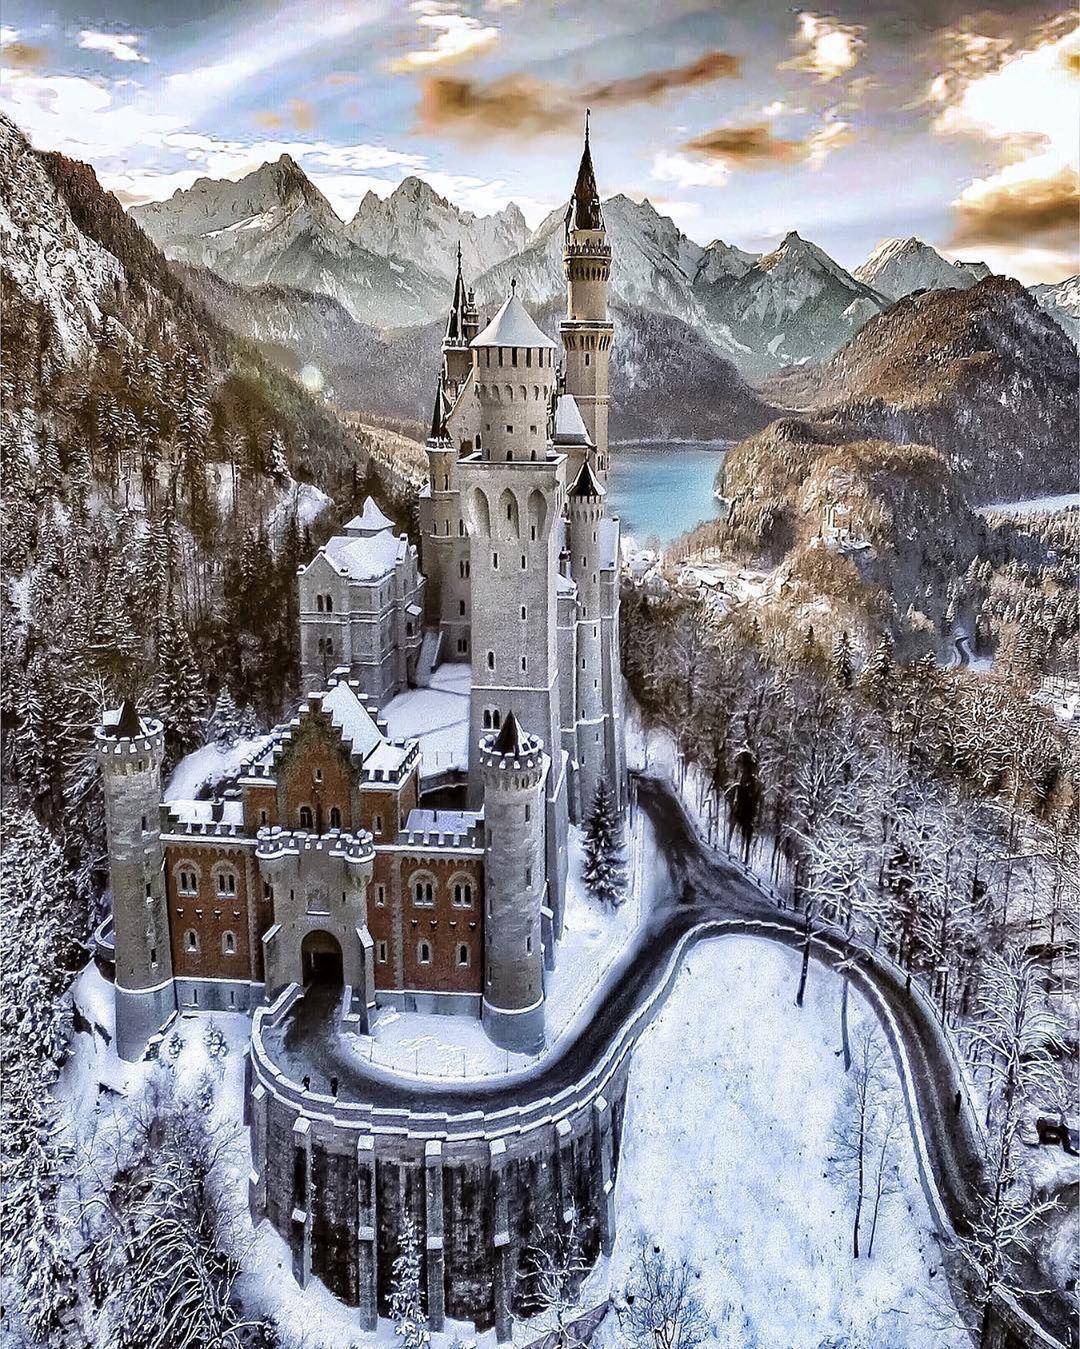 Nature On Instagram Fairytale Castle Schloss Neuschwanstein Bavaria Germany Photo By Alaa Oth Neuschwanstein Castle Germany Castles Beautiful Castles